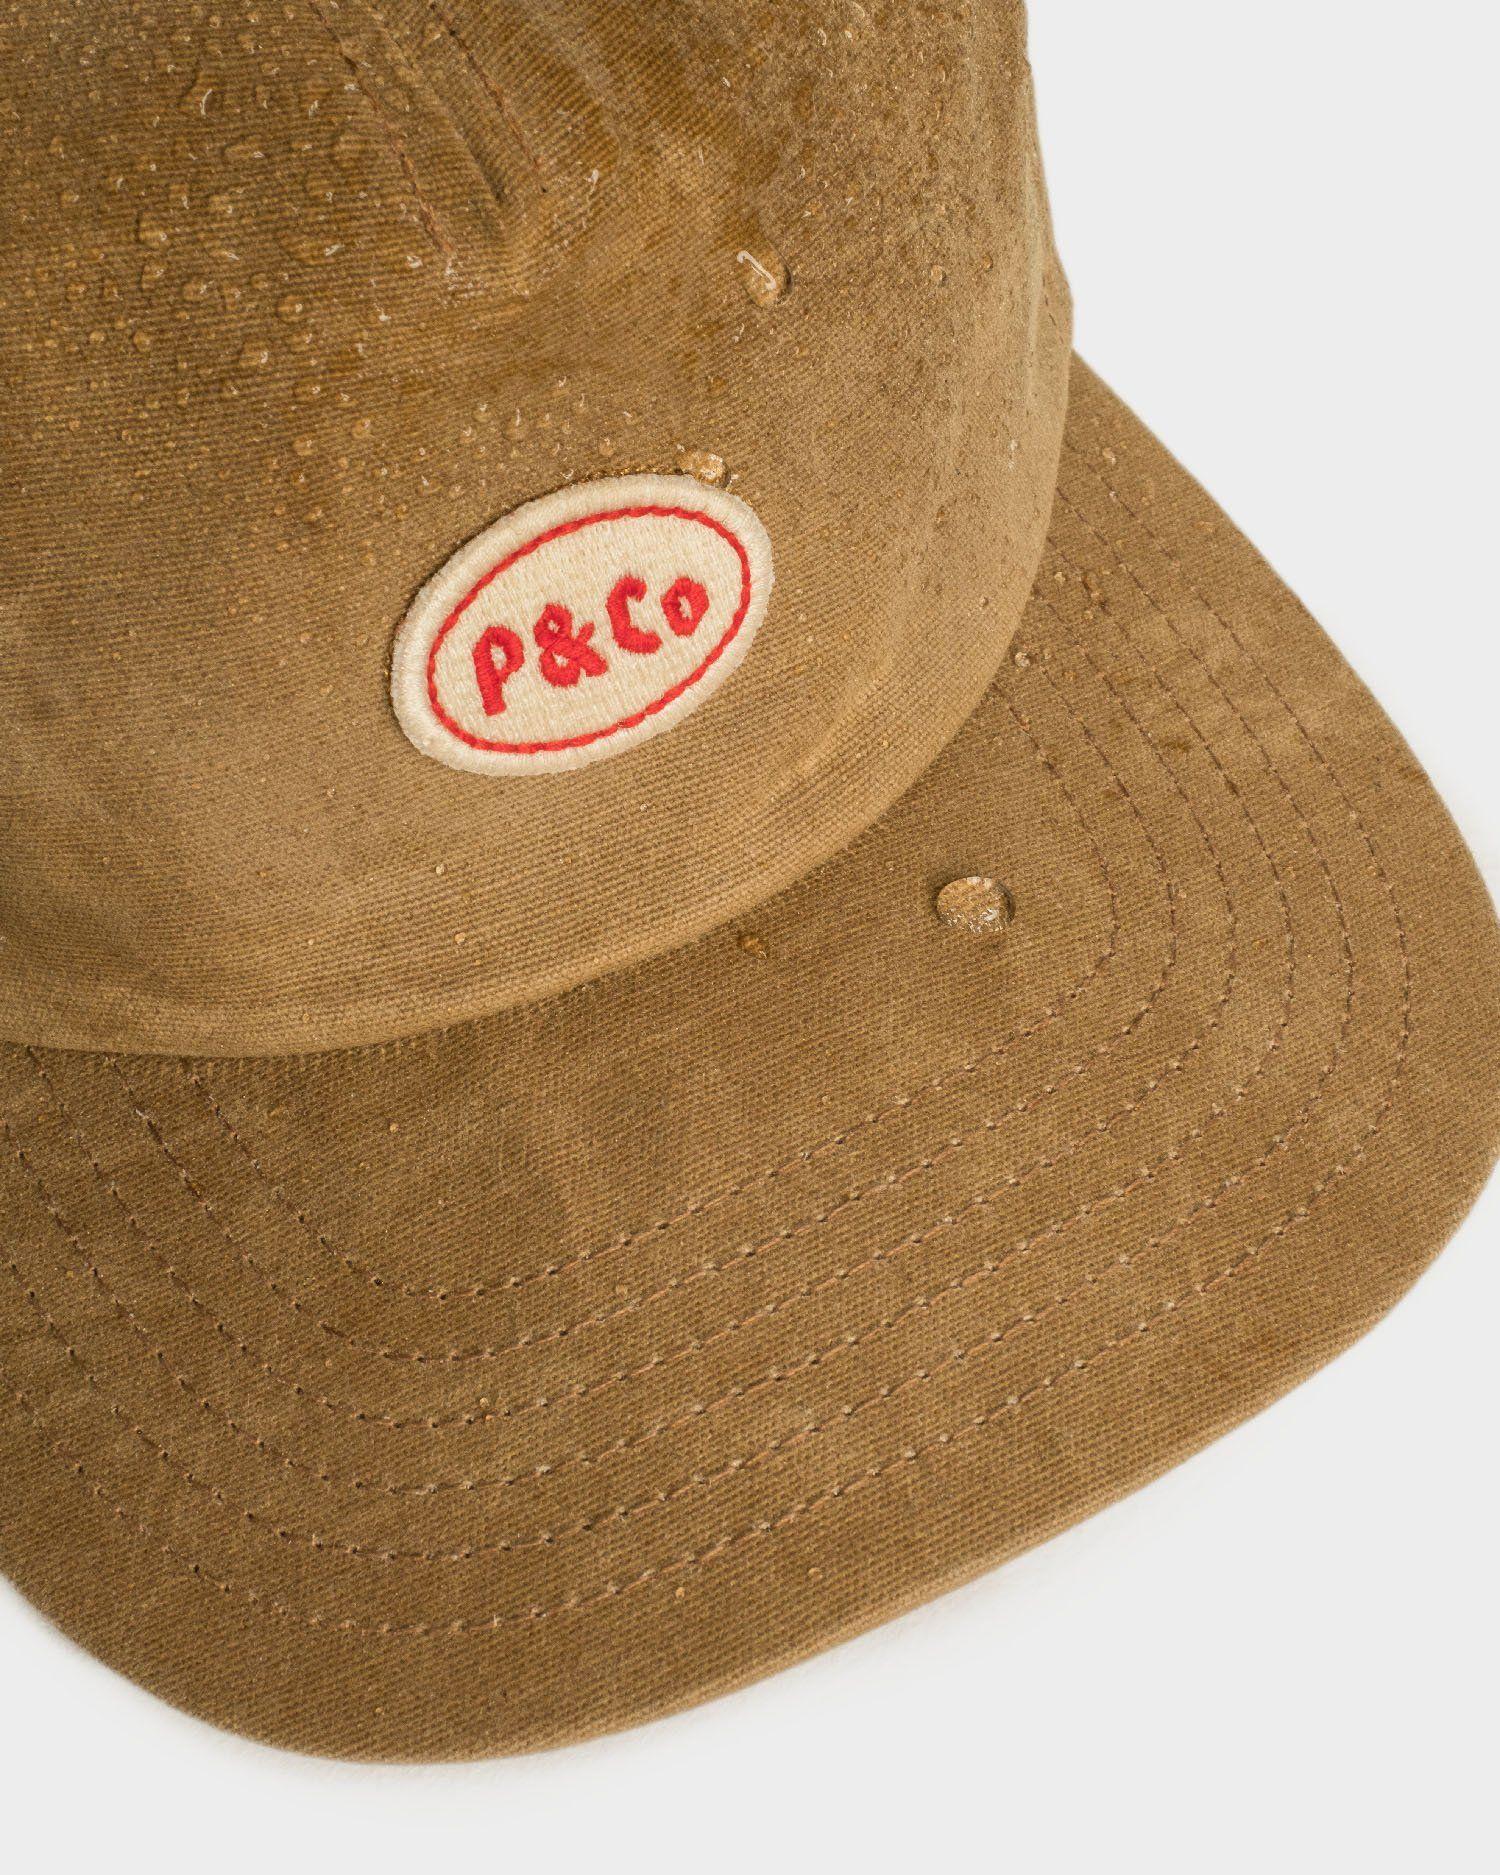 b44ab860a7ee93 Waxed Mechanic Sand 5 Panel Cap | Headwear – P&Co Wax, Baseball Hats,  Baseball